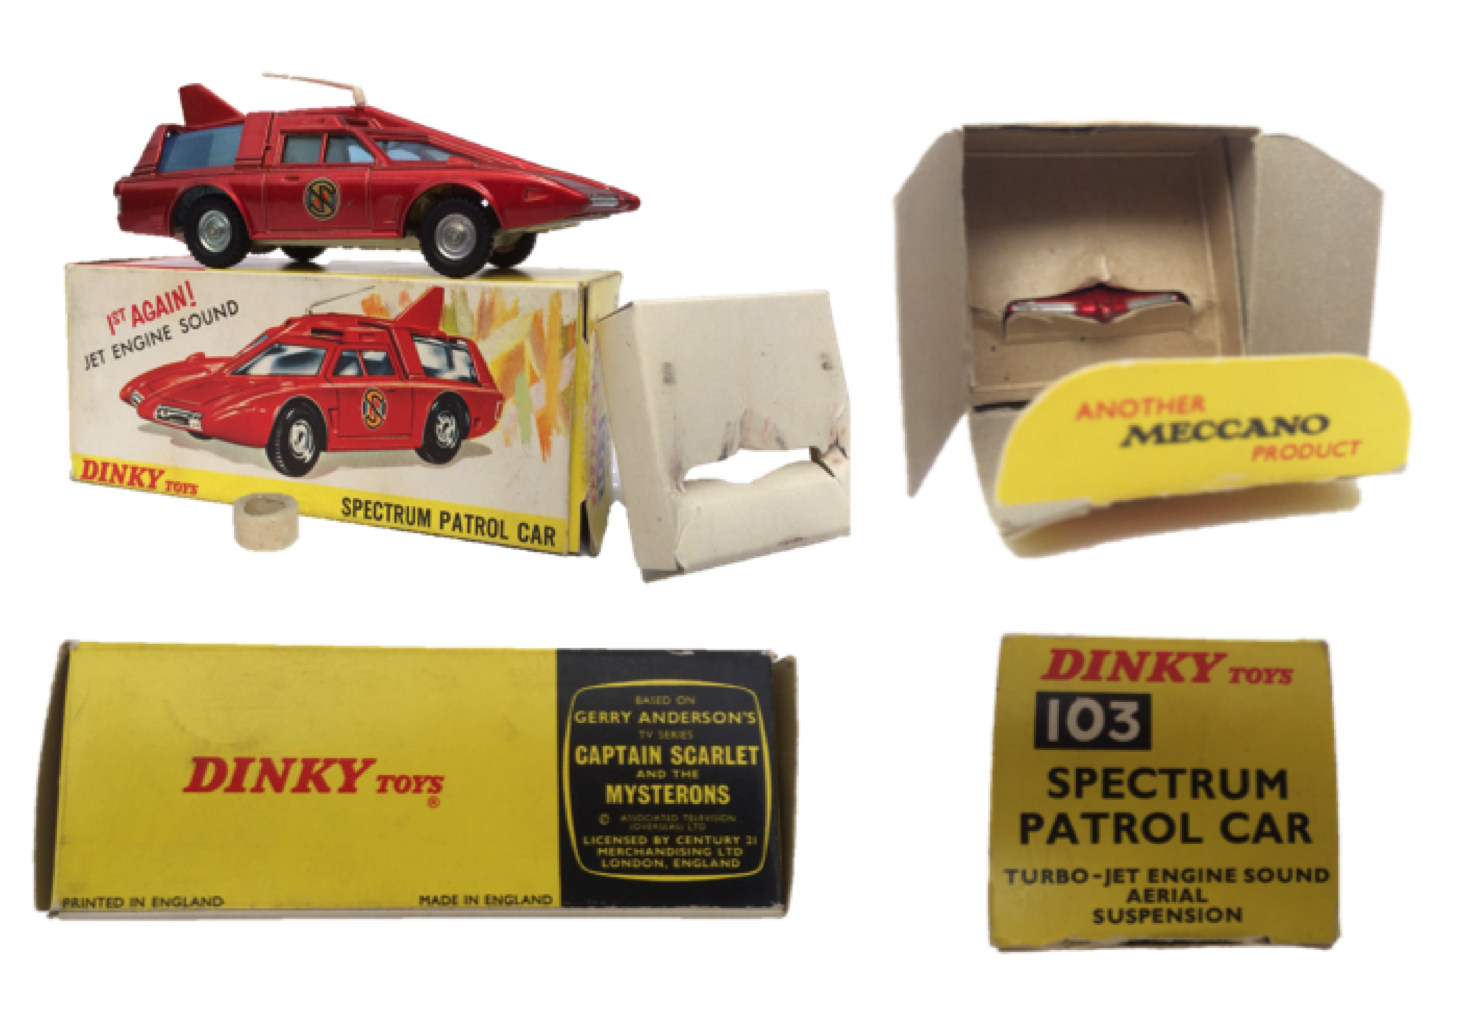 103 SPC Box cardboard.png